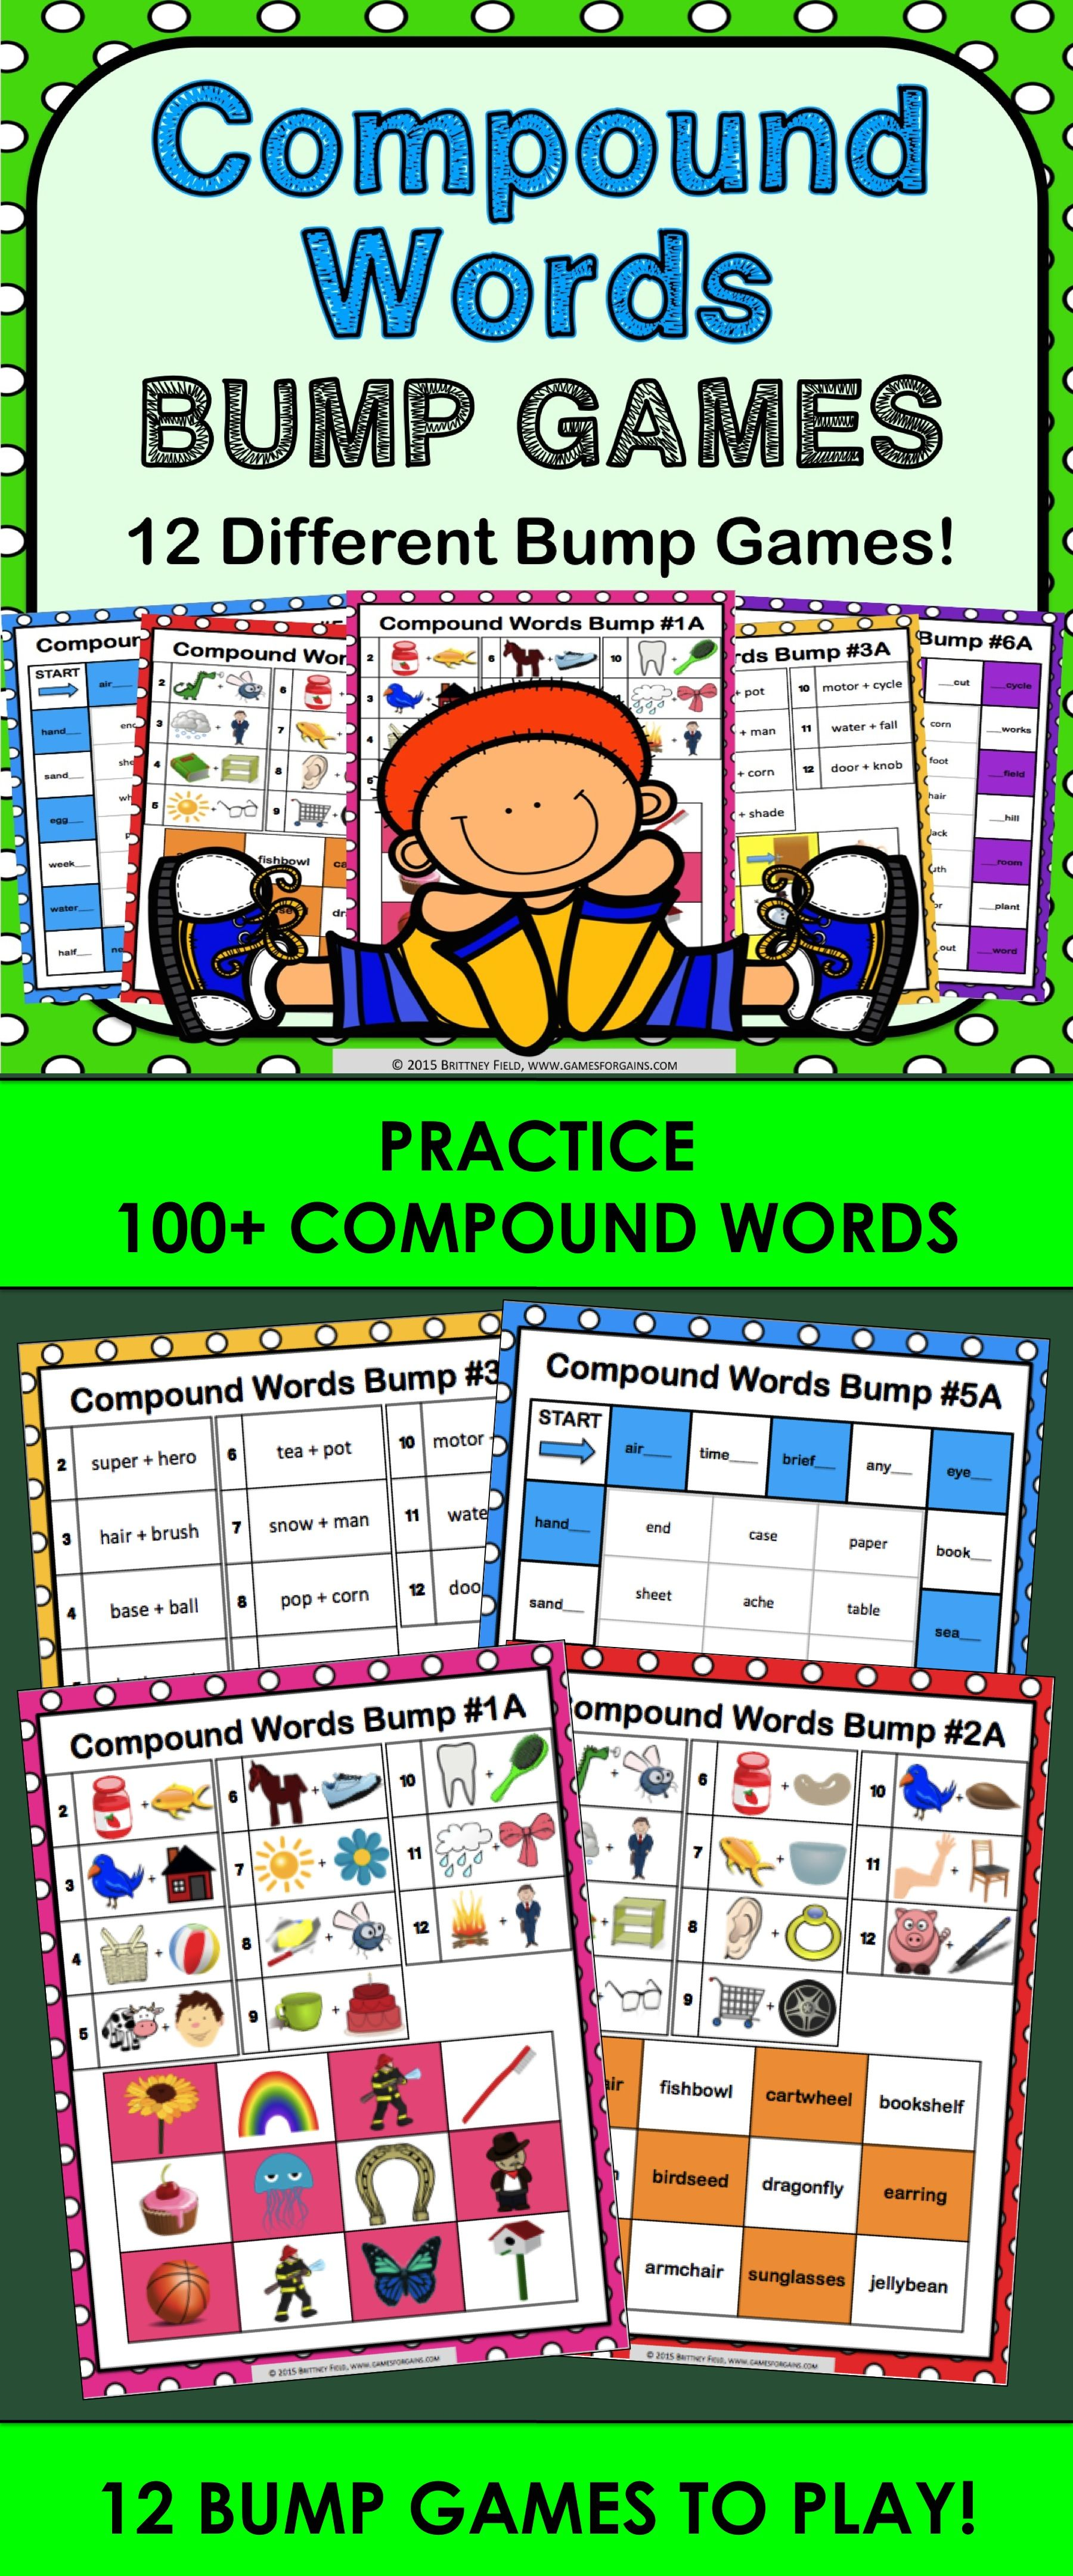 BUMP! Compound Words Activity 12 Compound Words Games